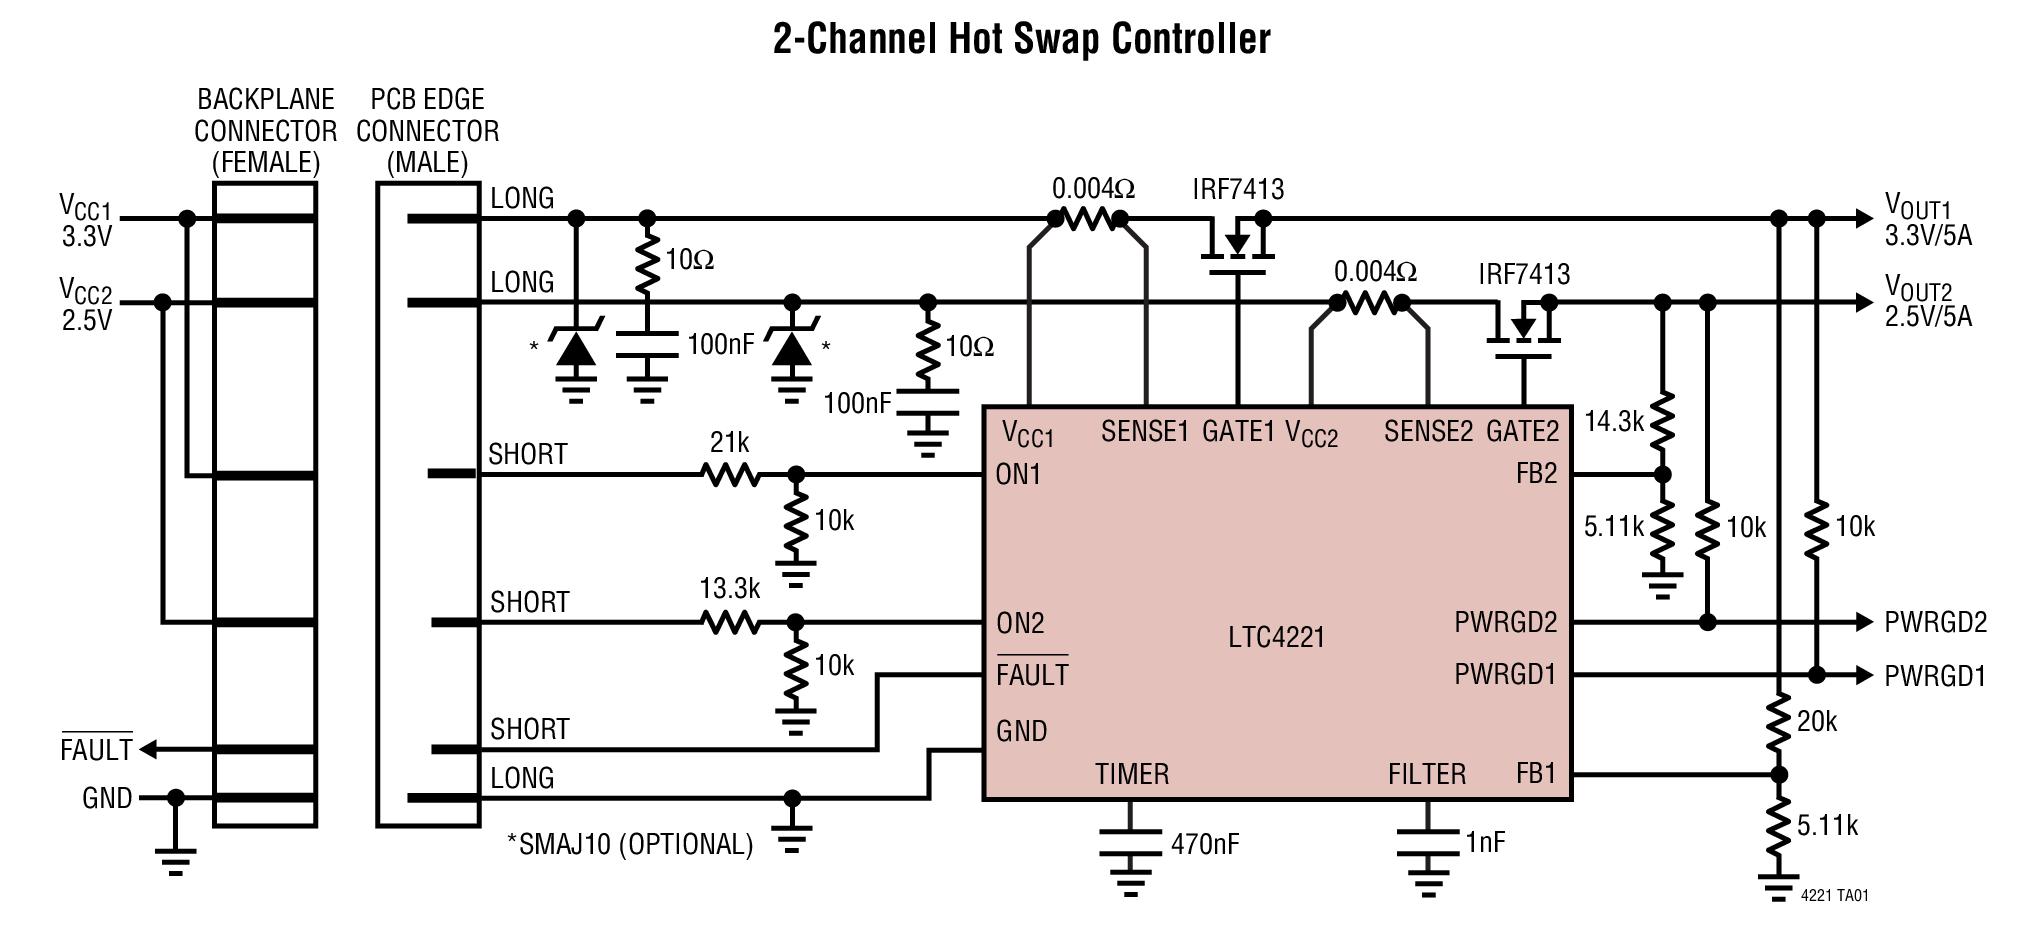 LTC4221 是一款两通道热插拔 (Hot SwapTM) 控制器,允许电路板在带电背板上安全地插入和拔出。该器件采用两个独立的高端栅极驱动器来控制两个外部 N 沟道传输晶体管,可利用电流折返功能来使输出电压斜坡上升,以限制启动期间的浪涌电流。在 GATE 引脚上无需布设外部补偿电容器。对于 2.